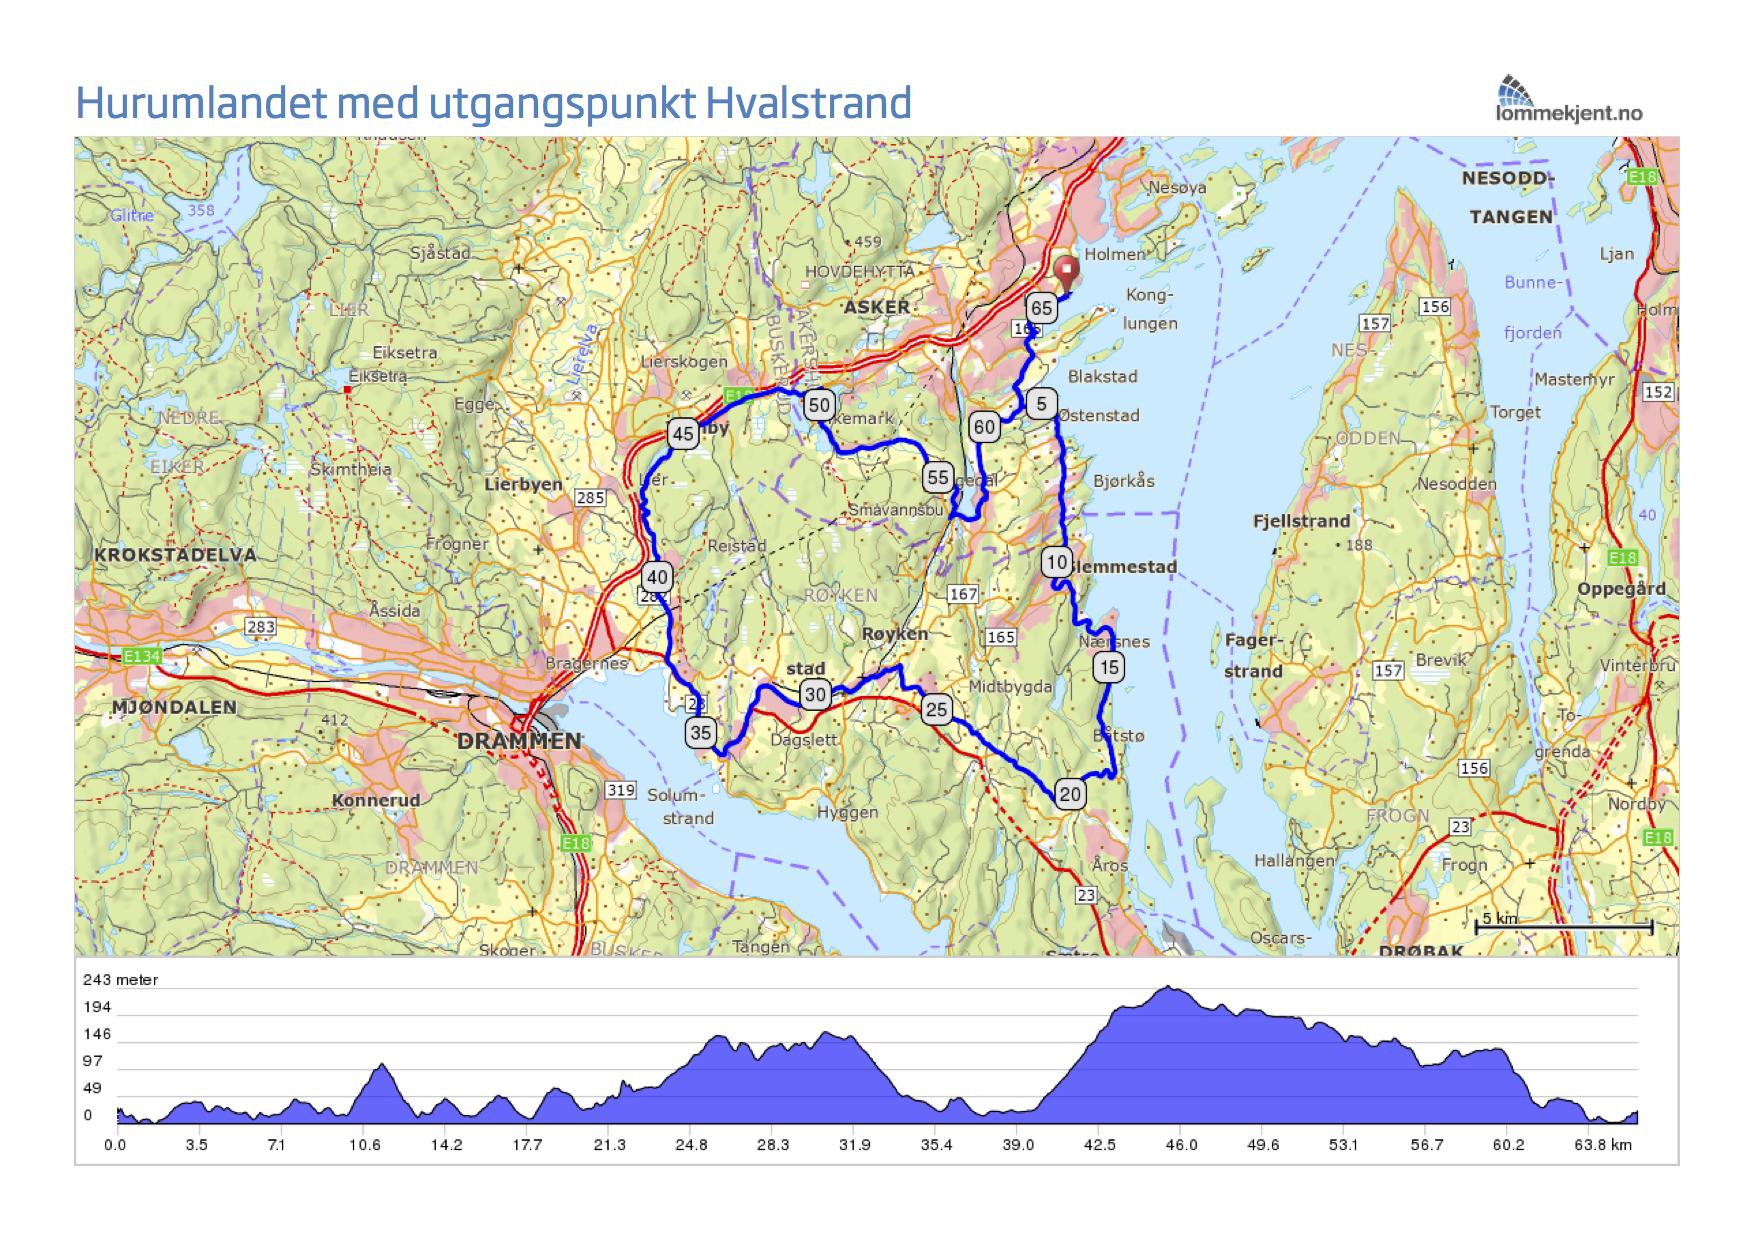 trollsykling kart Hurumlandet med utgangspunkt Hvalstrand trollsykling kart